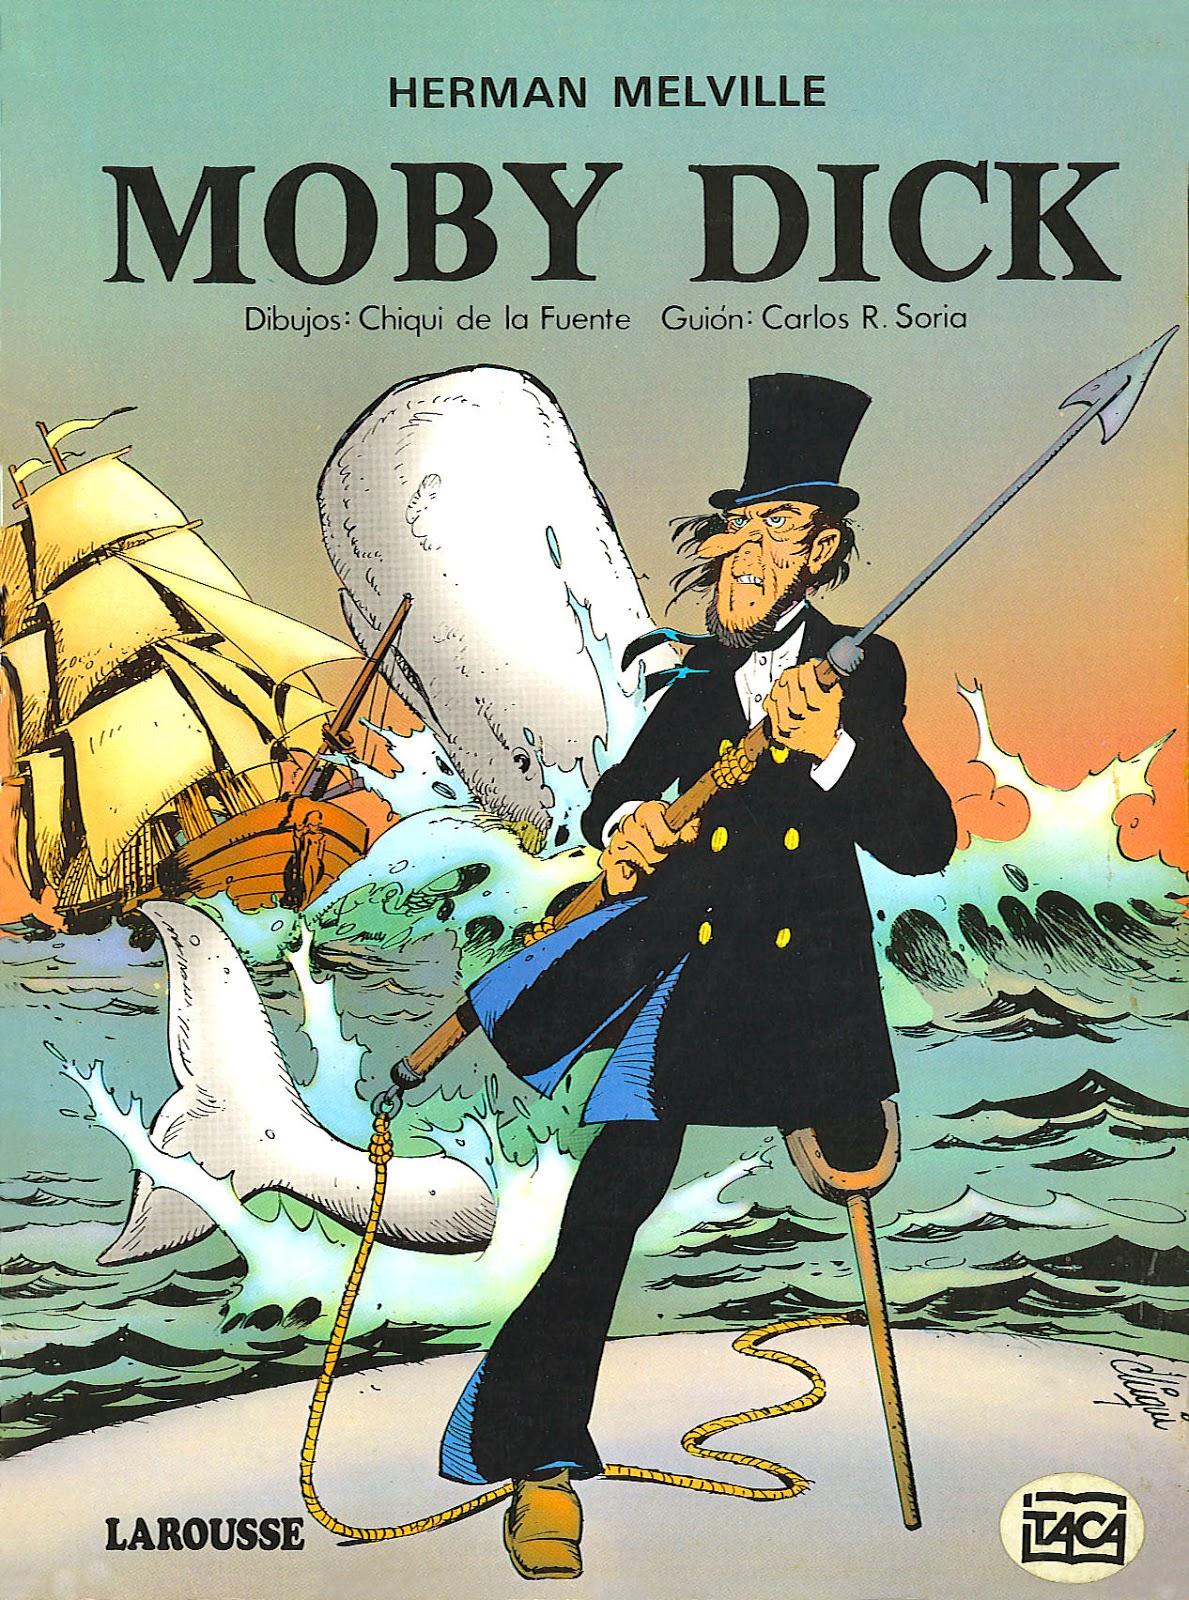 Resumen sobre moby dick